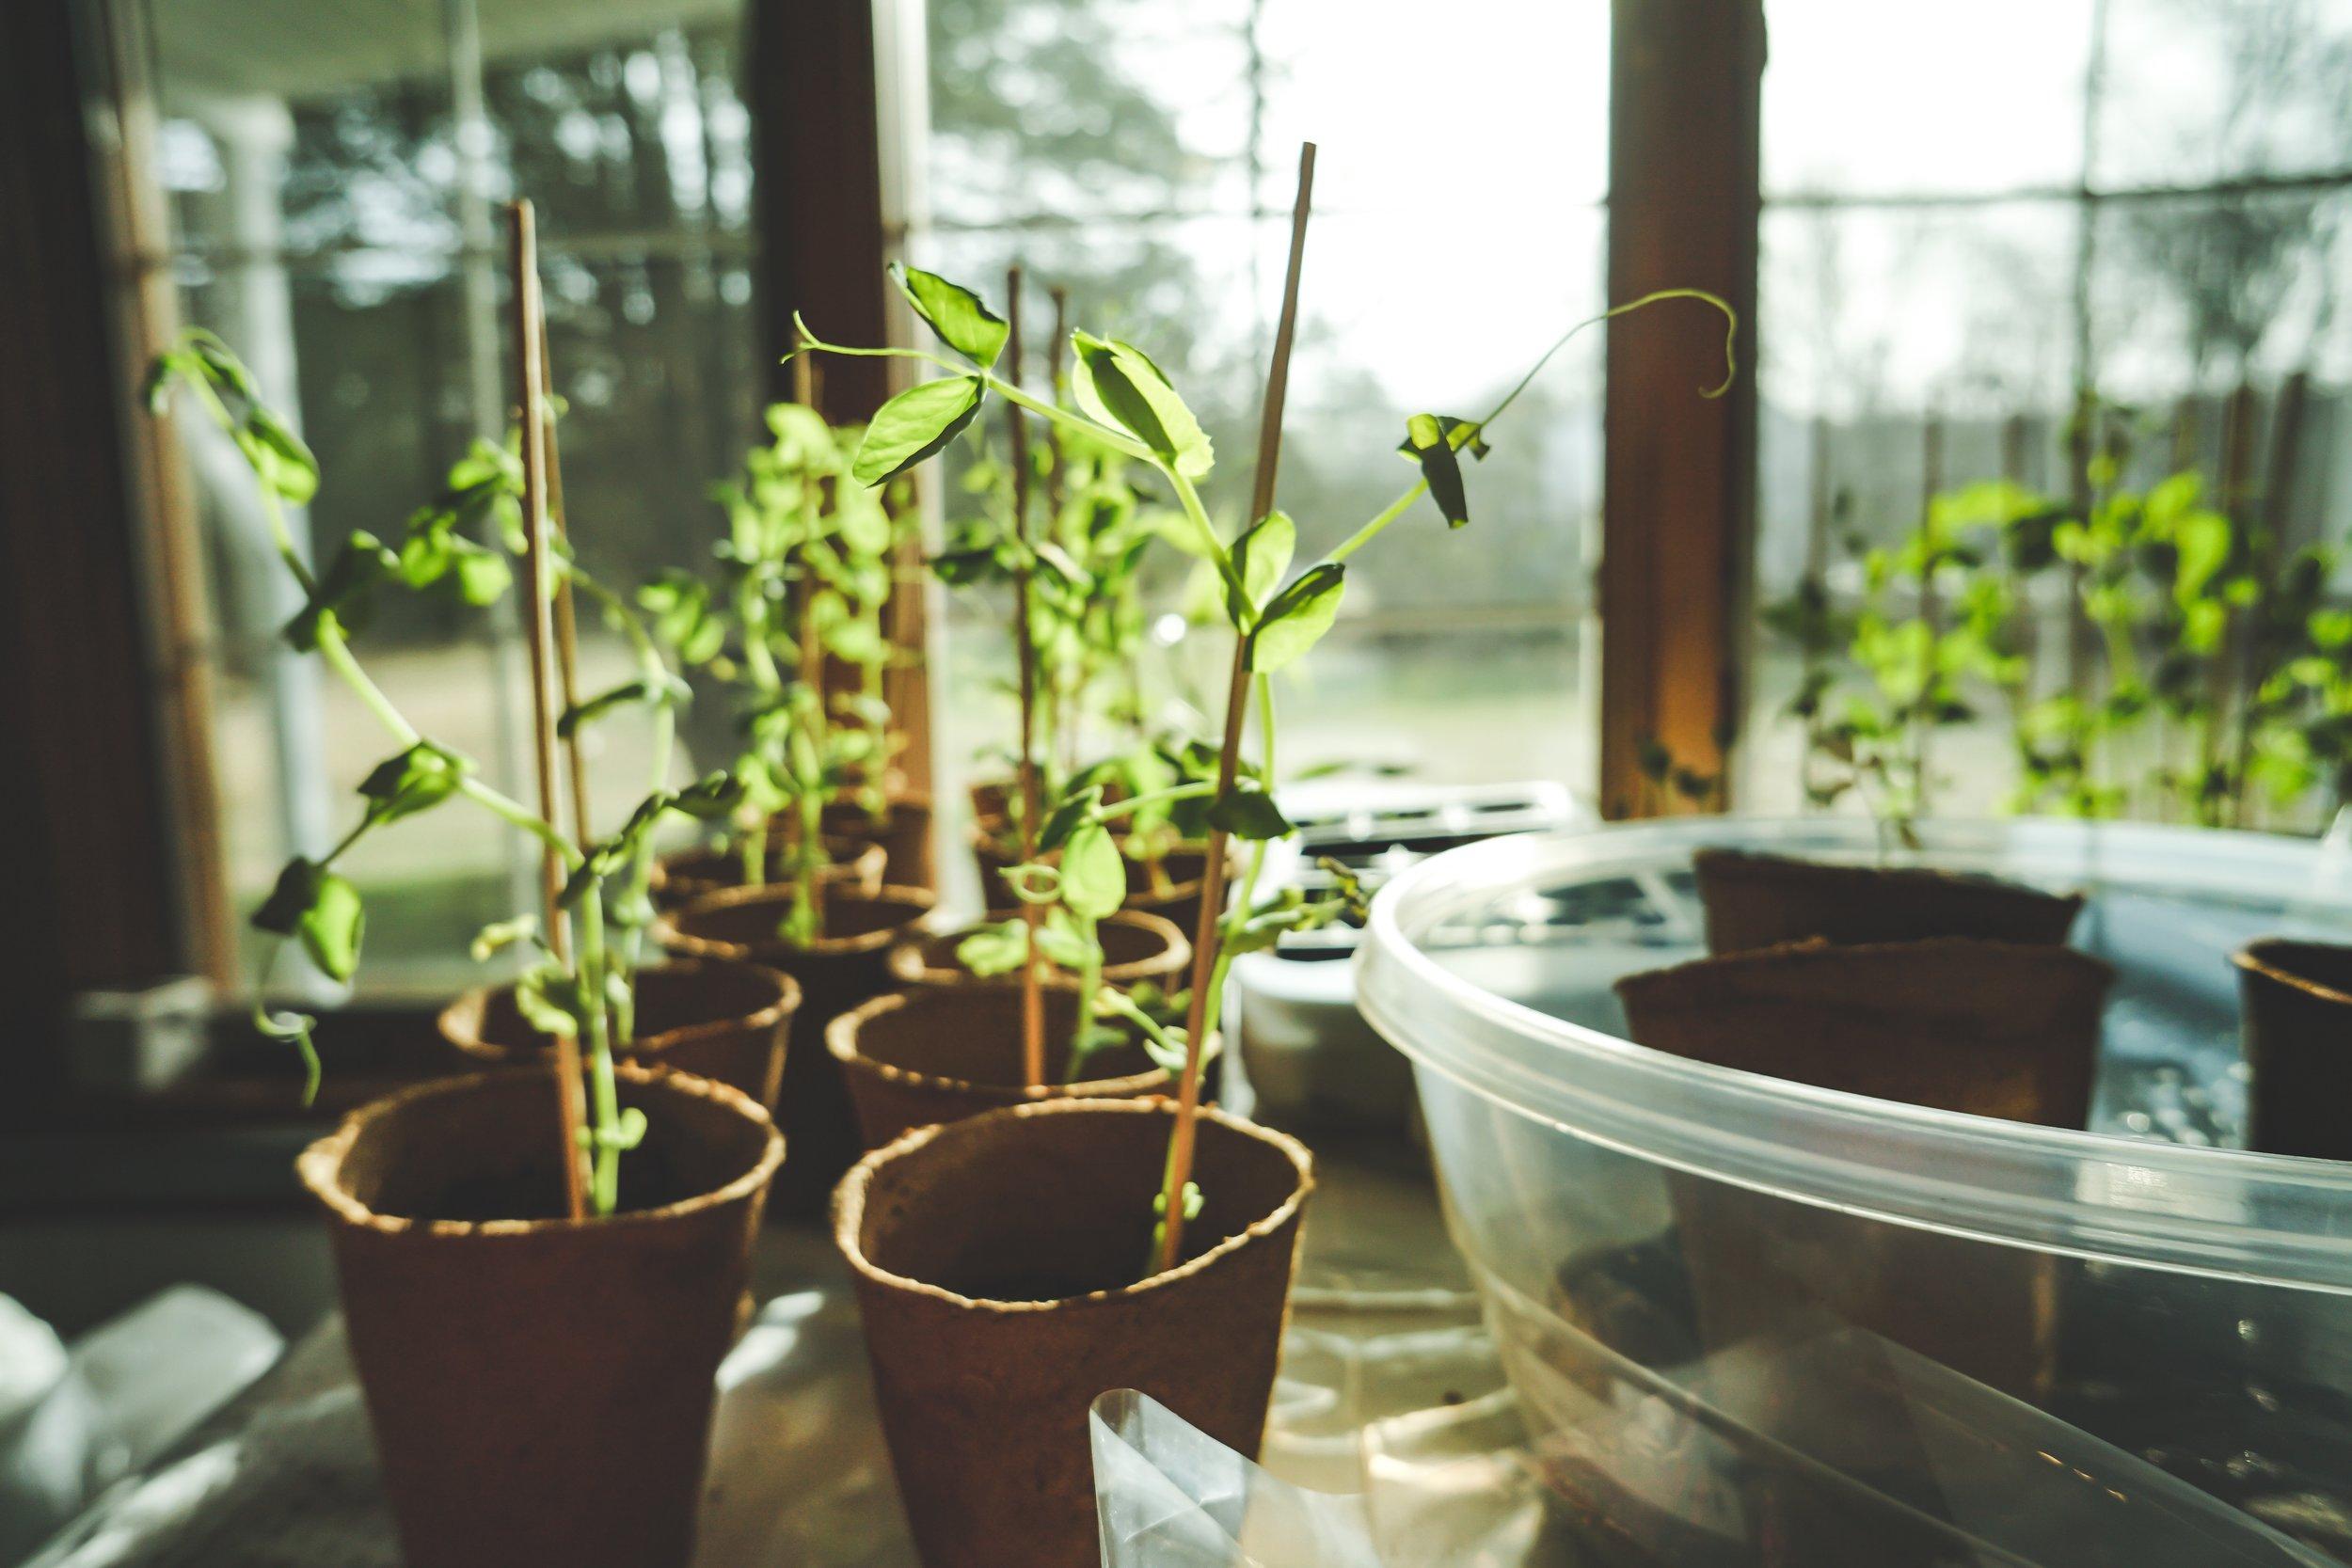 daylight-greenhouse-grow-1105018.jpg